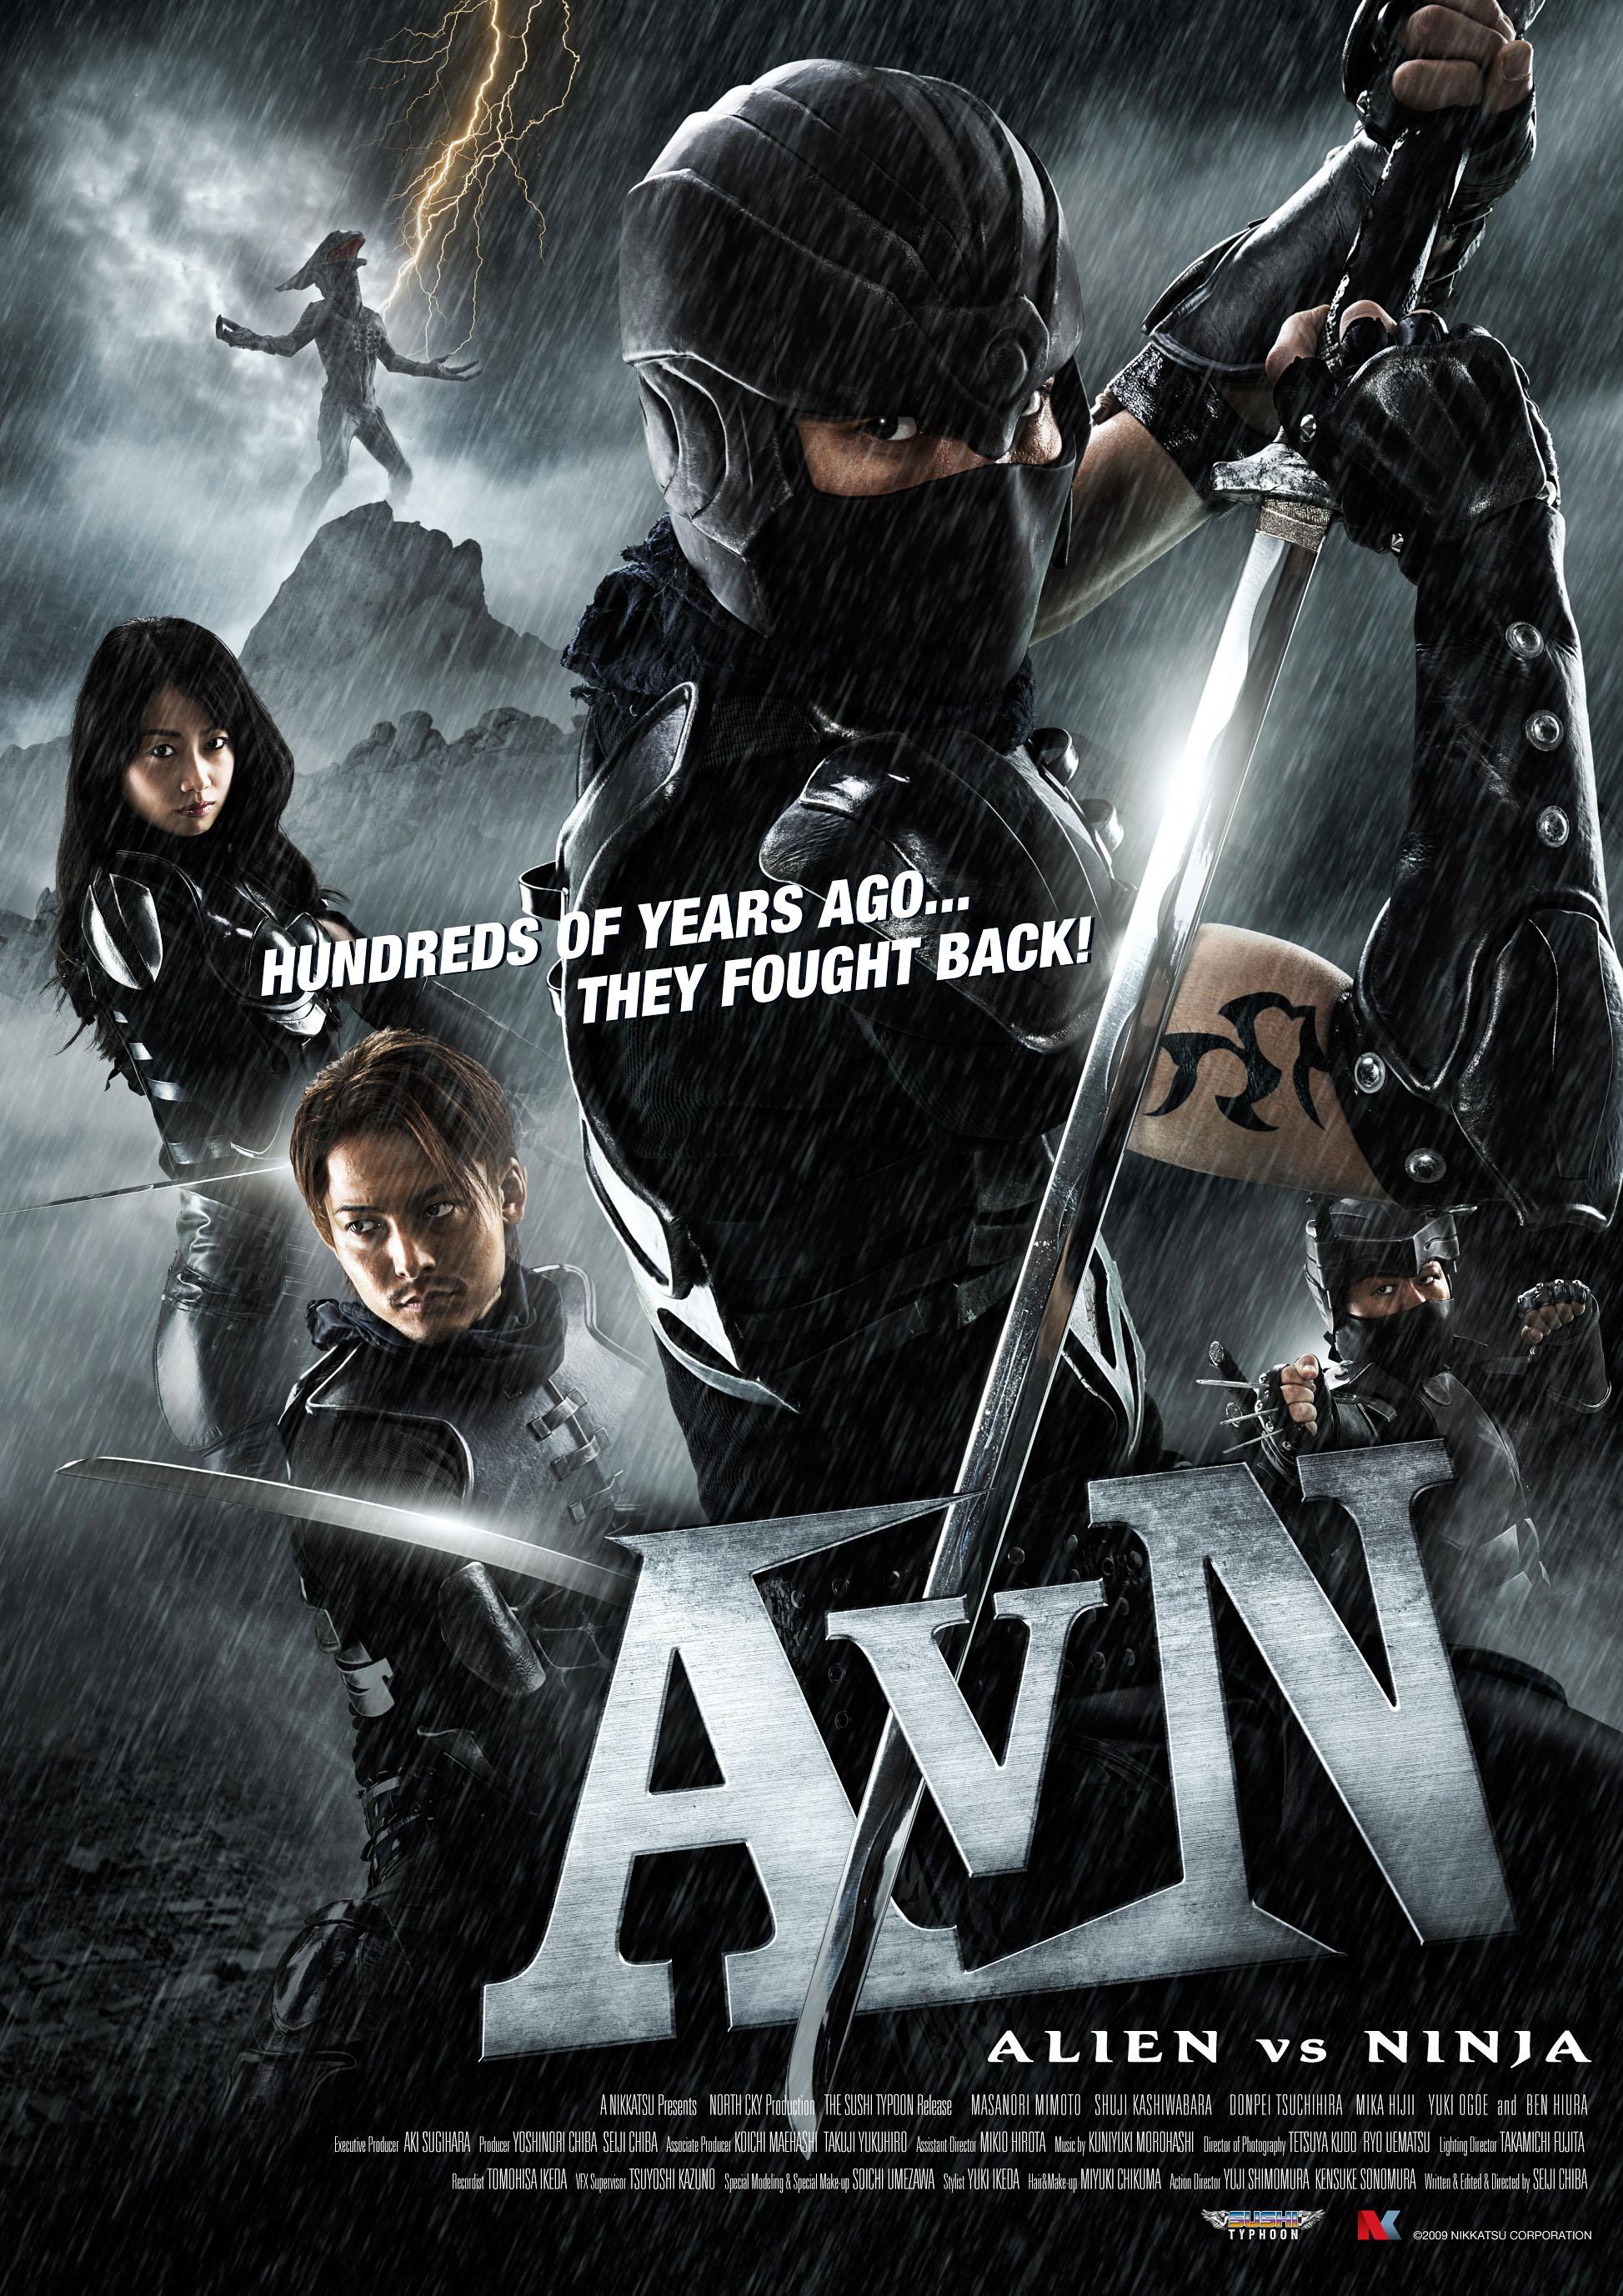 alien vs ninja full movie in hindi free download hd